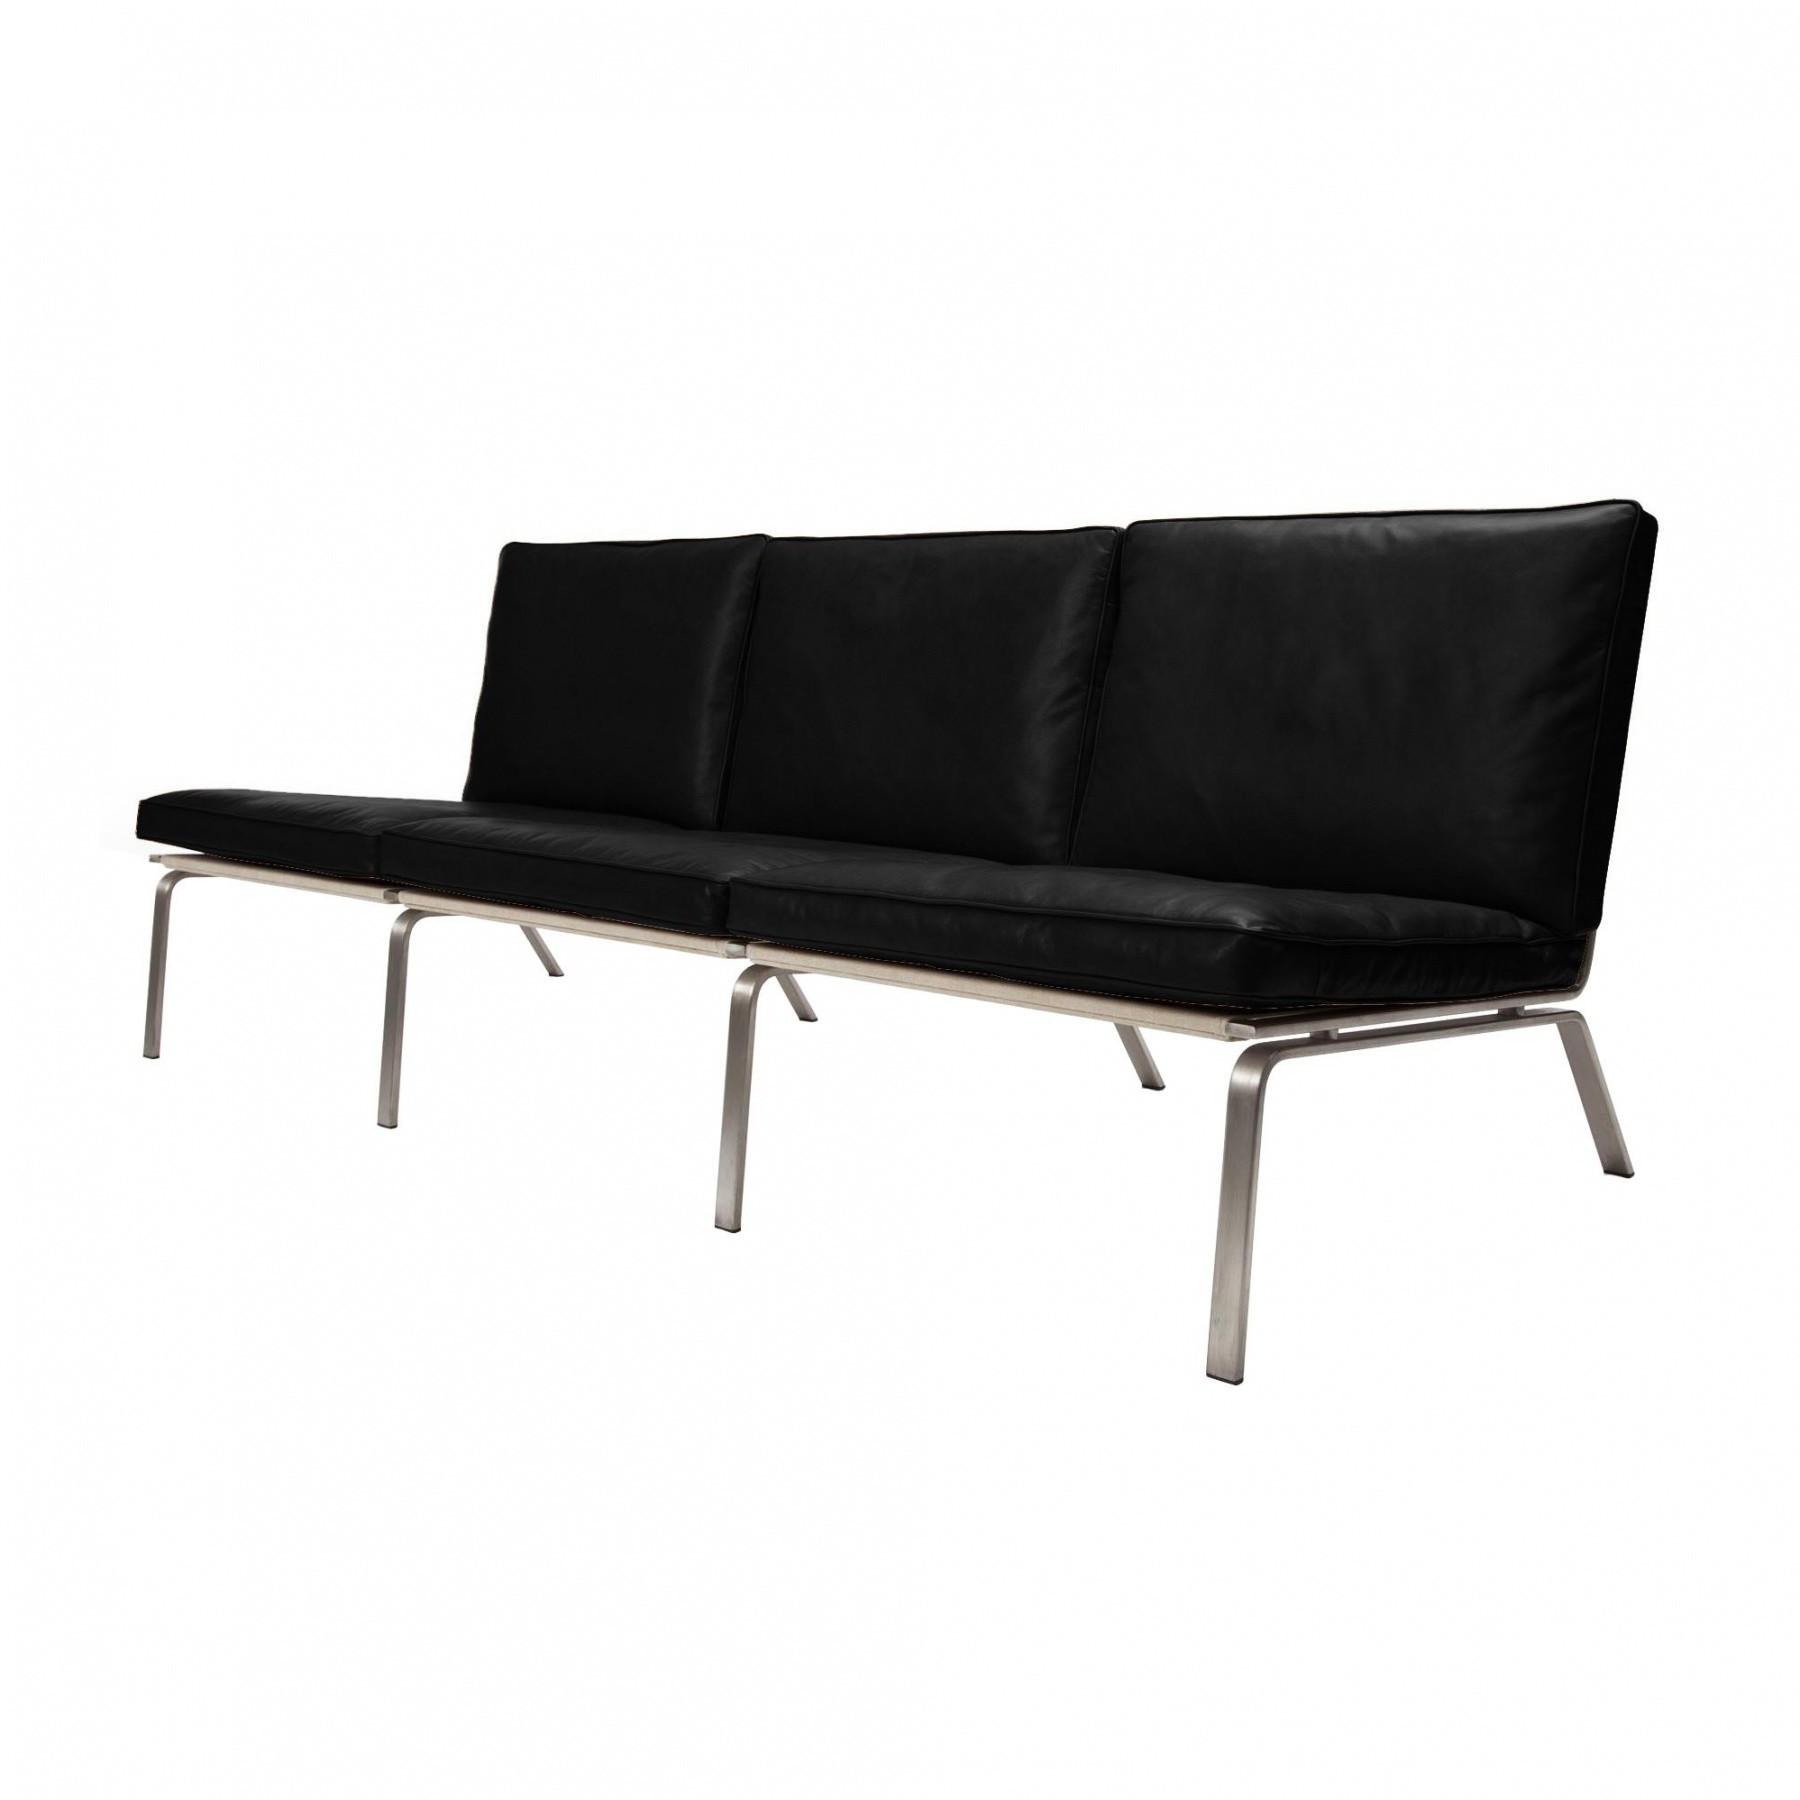 Norr 11 Man Lounge 3 Seater Sofa Ambientedirect